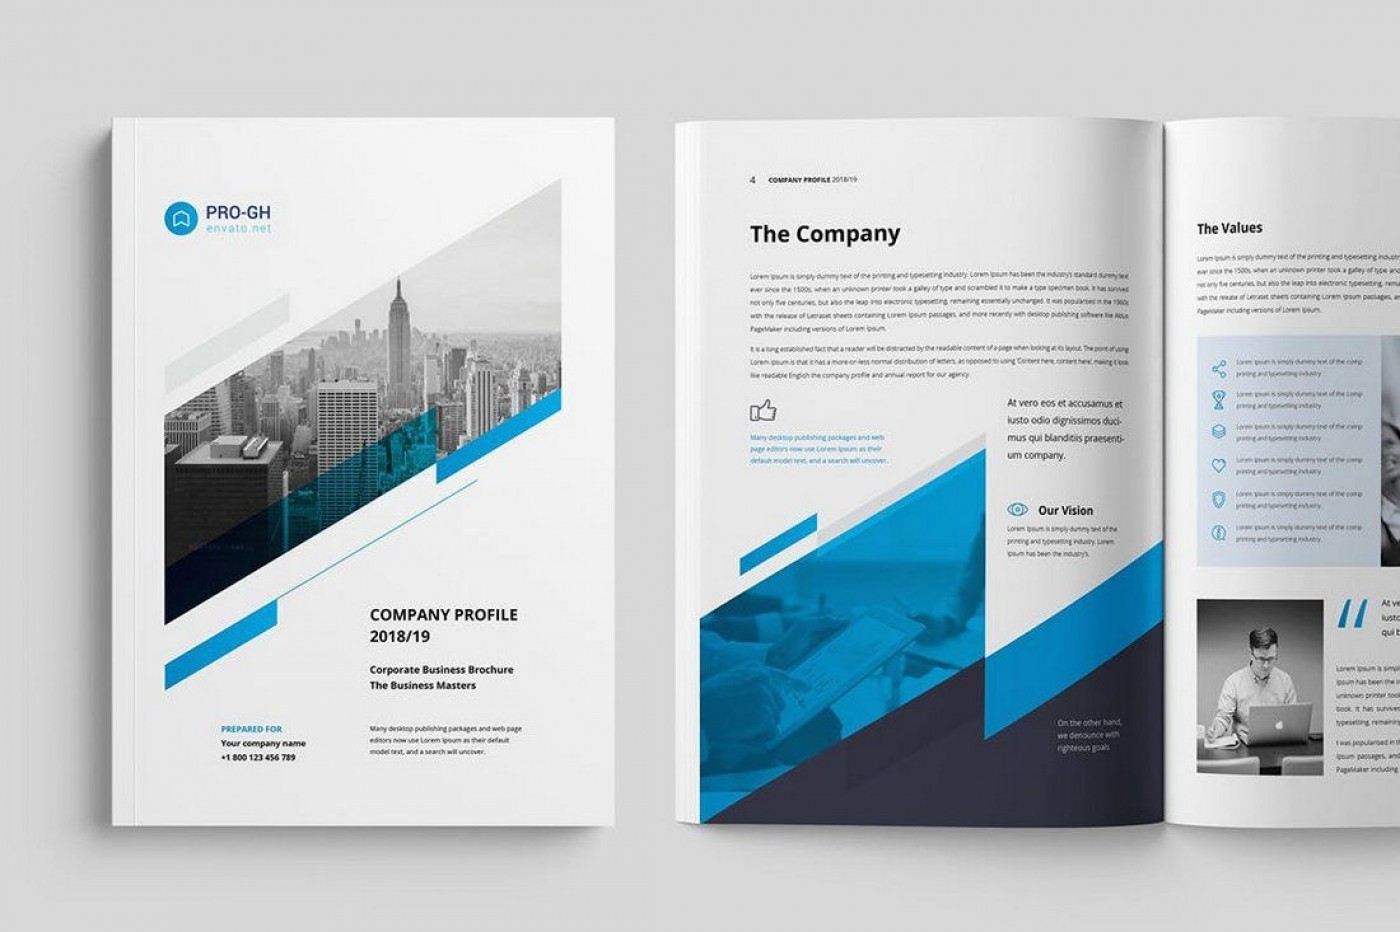 008 Best Corporate Brochure Design Template Psd Free Download Inspiration  Hotel1400